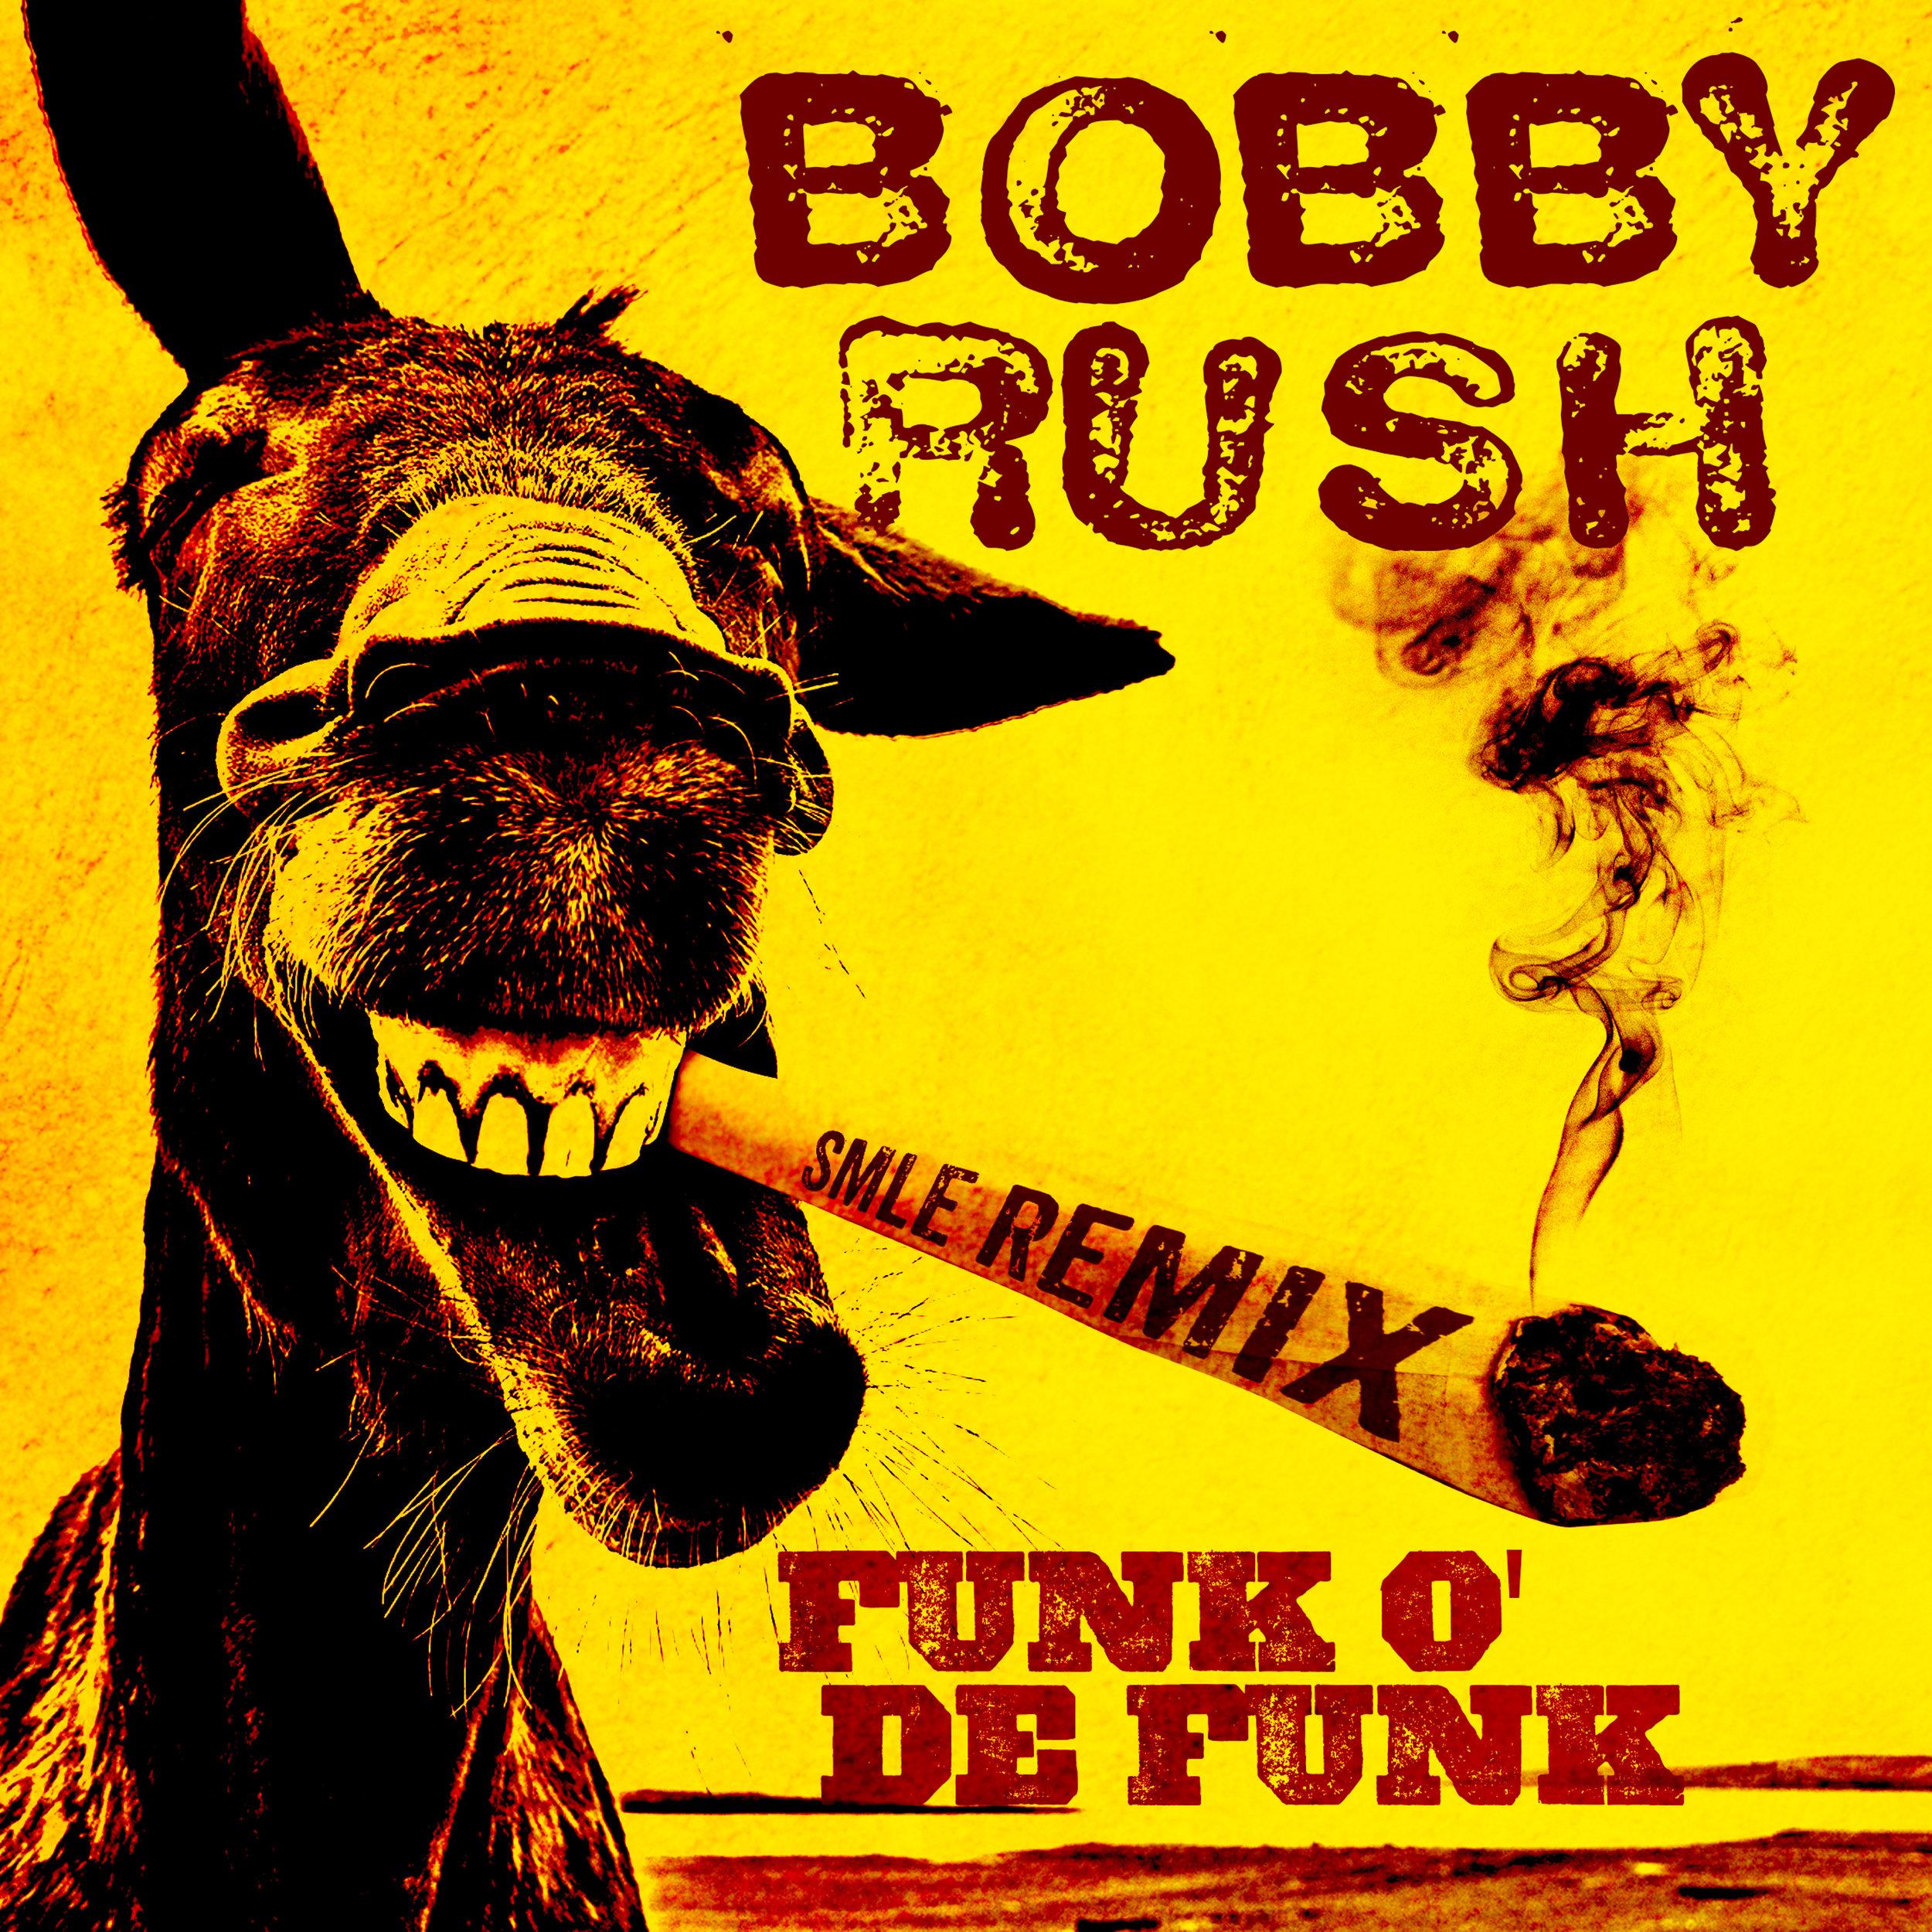 Funk O' De Funk (SMLE Remix)-2017 Grammy® nominee (Best Remixed Recording) - BOBBY RUSHROUNDER RECORDSMarch 31, 2017